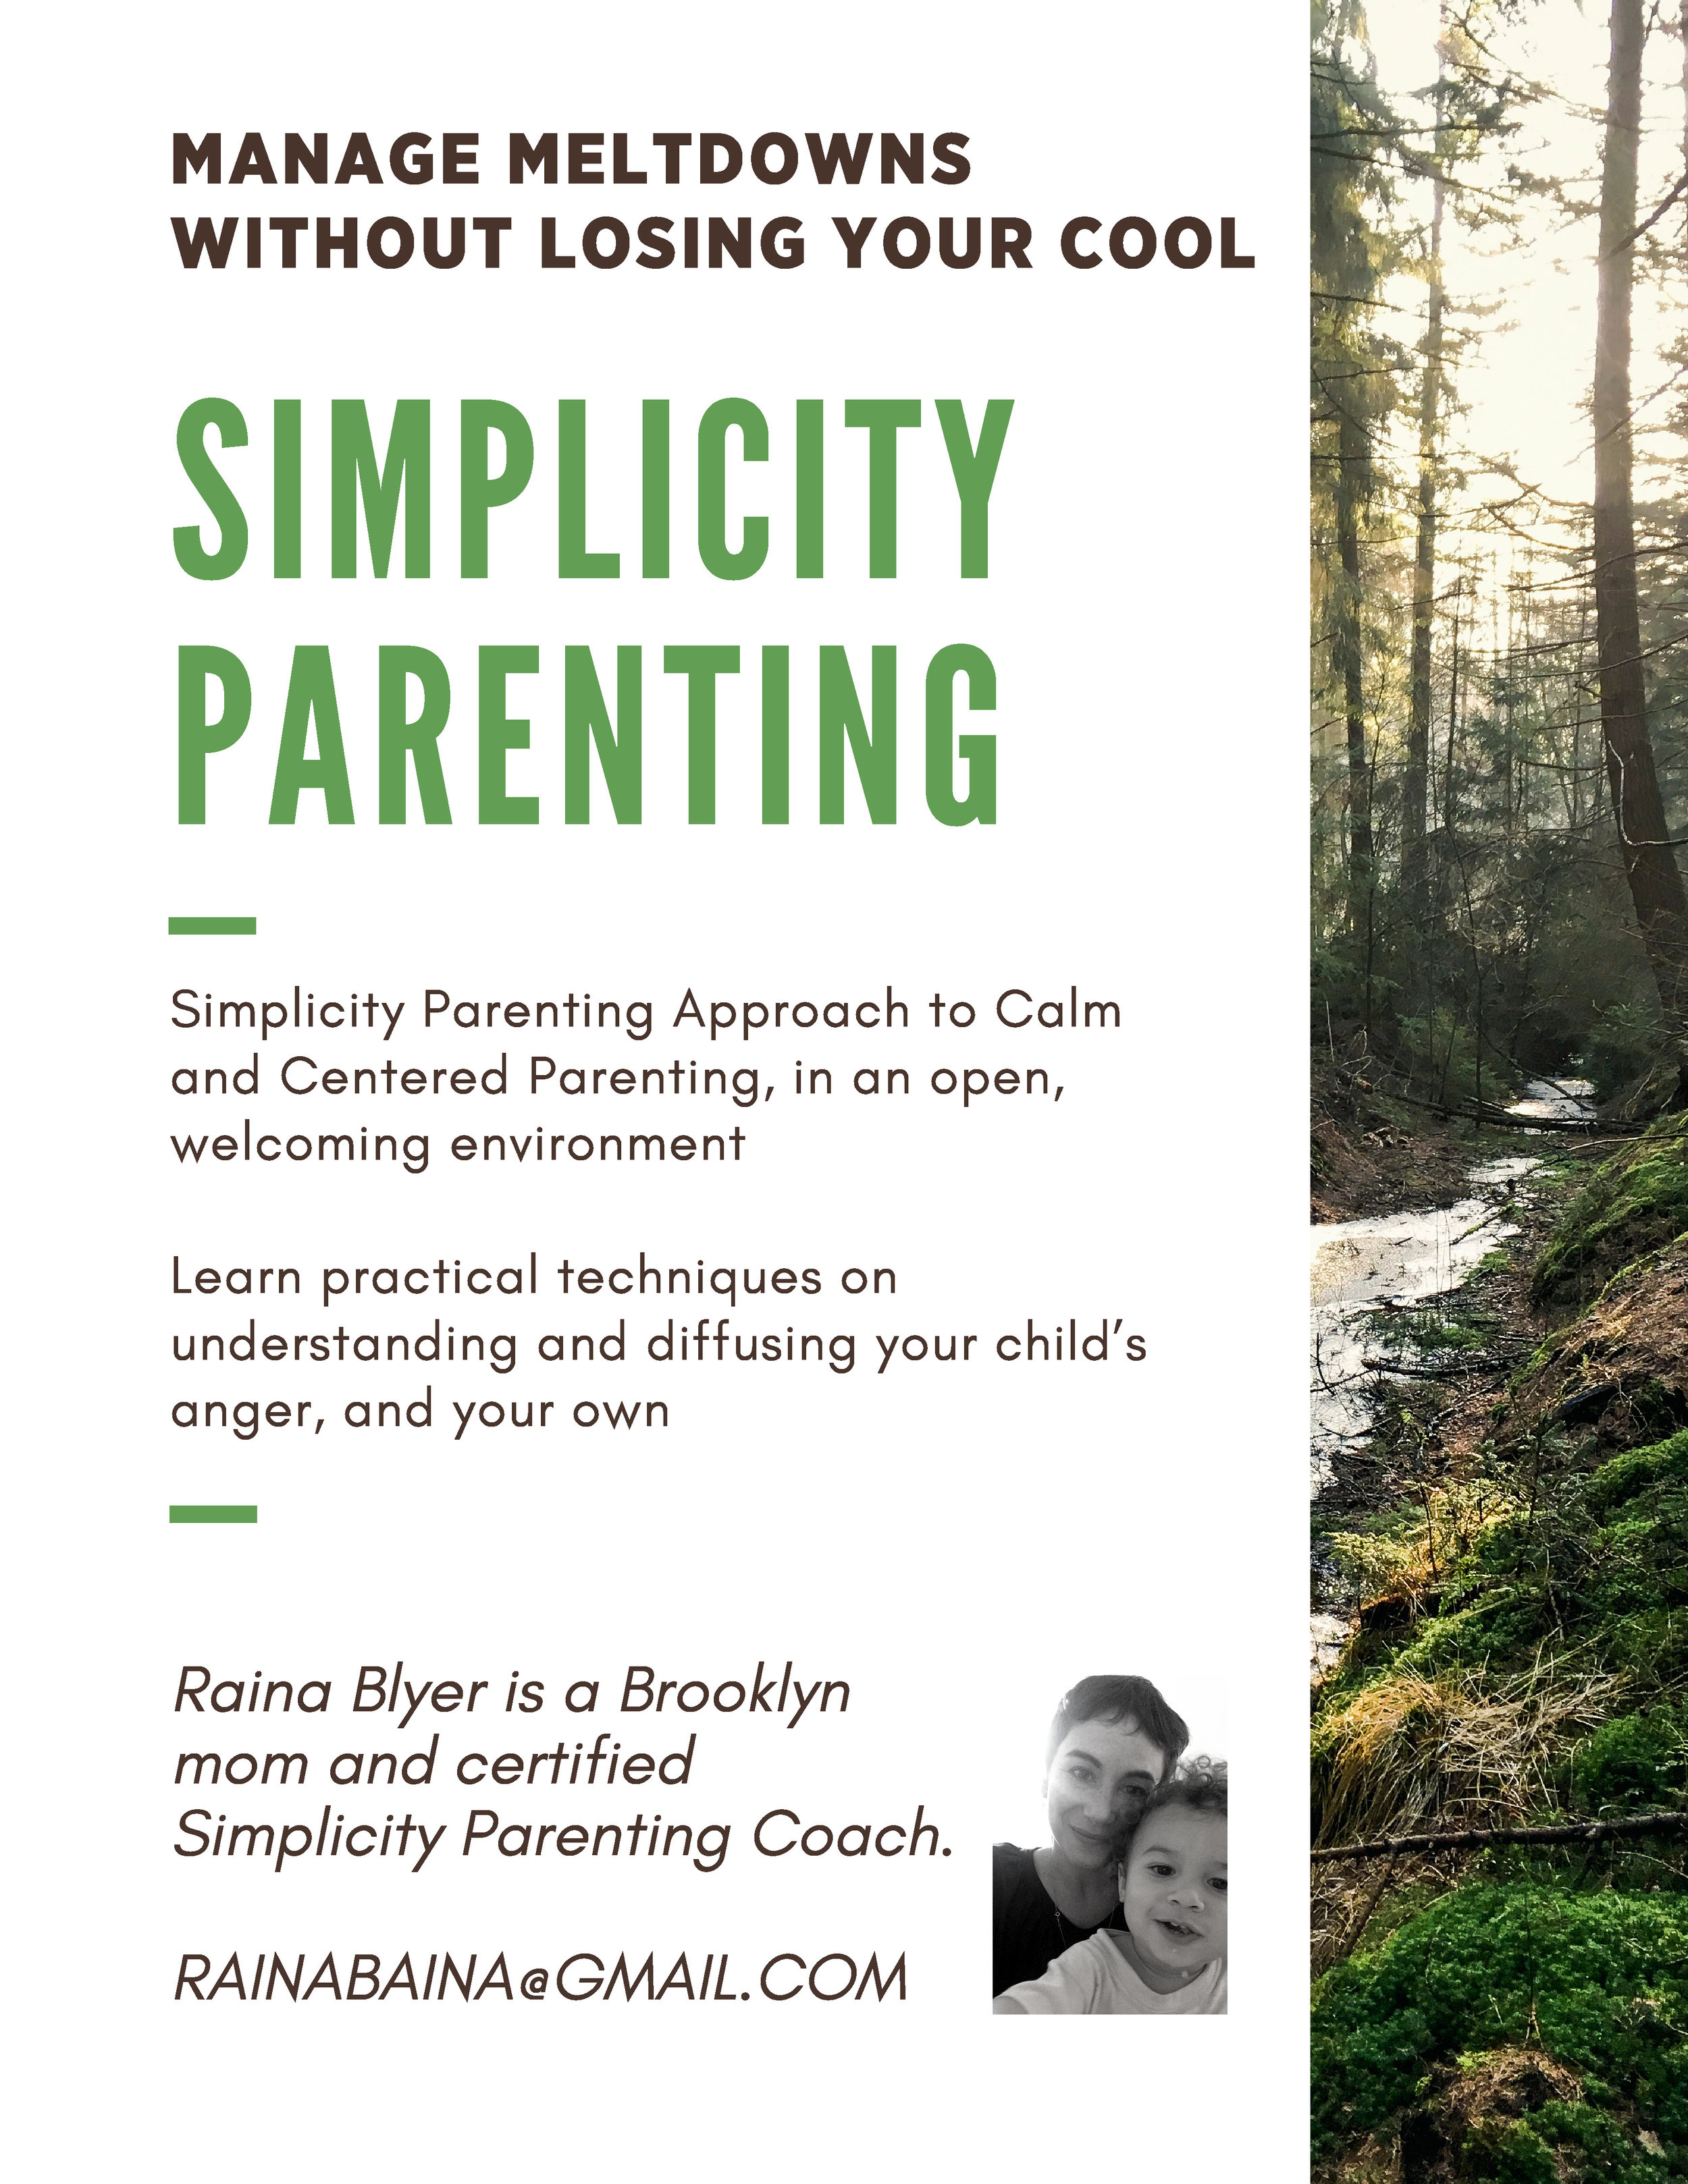 SIMPLICITY PARENTING (1).jpg